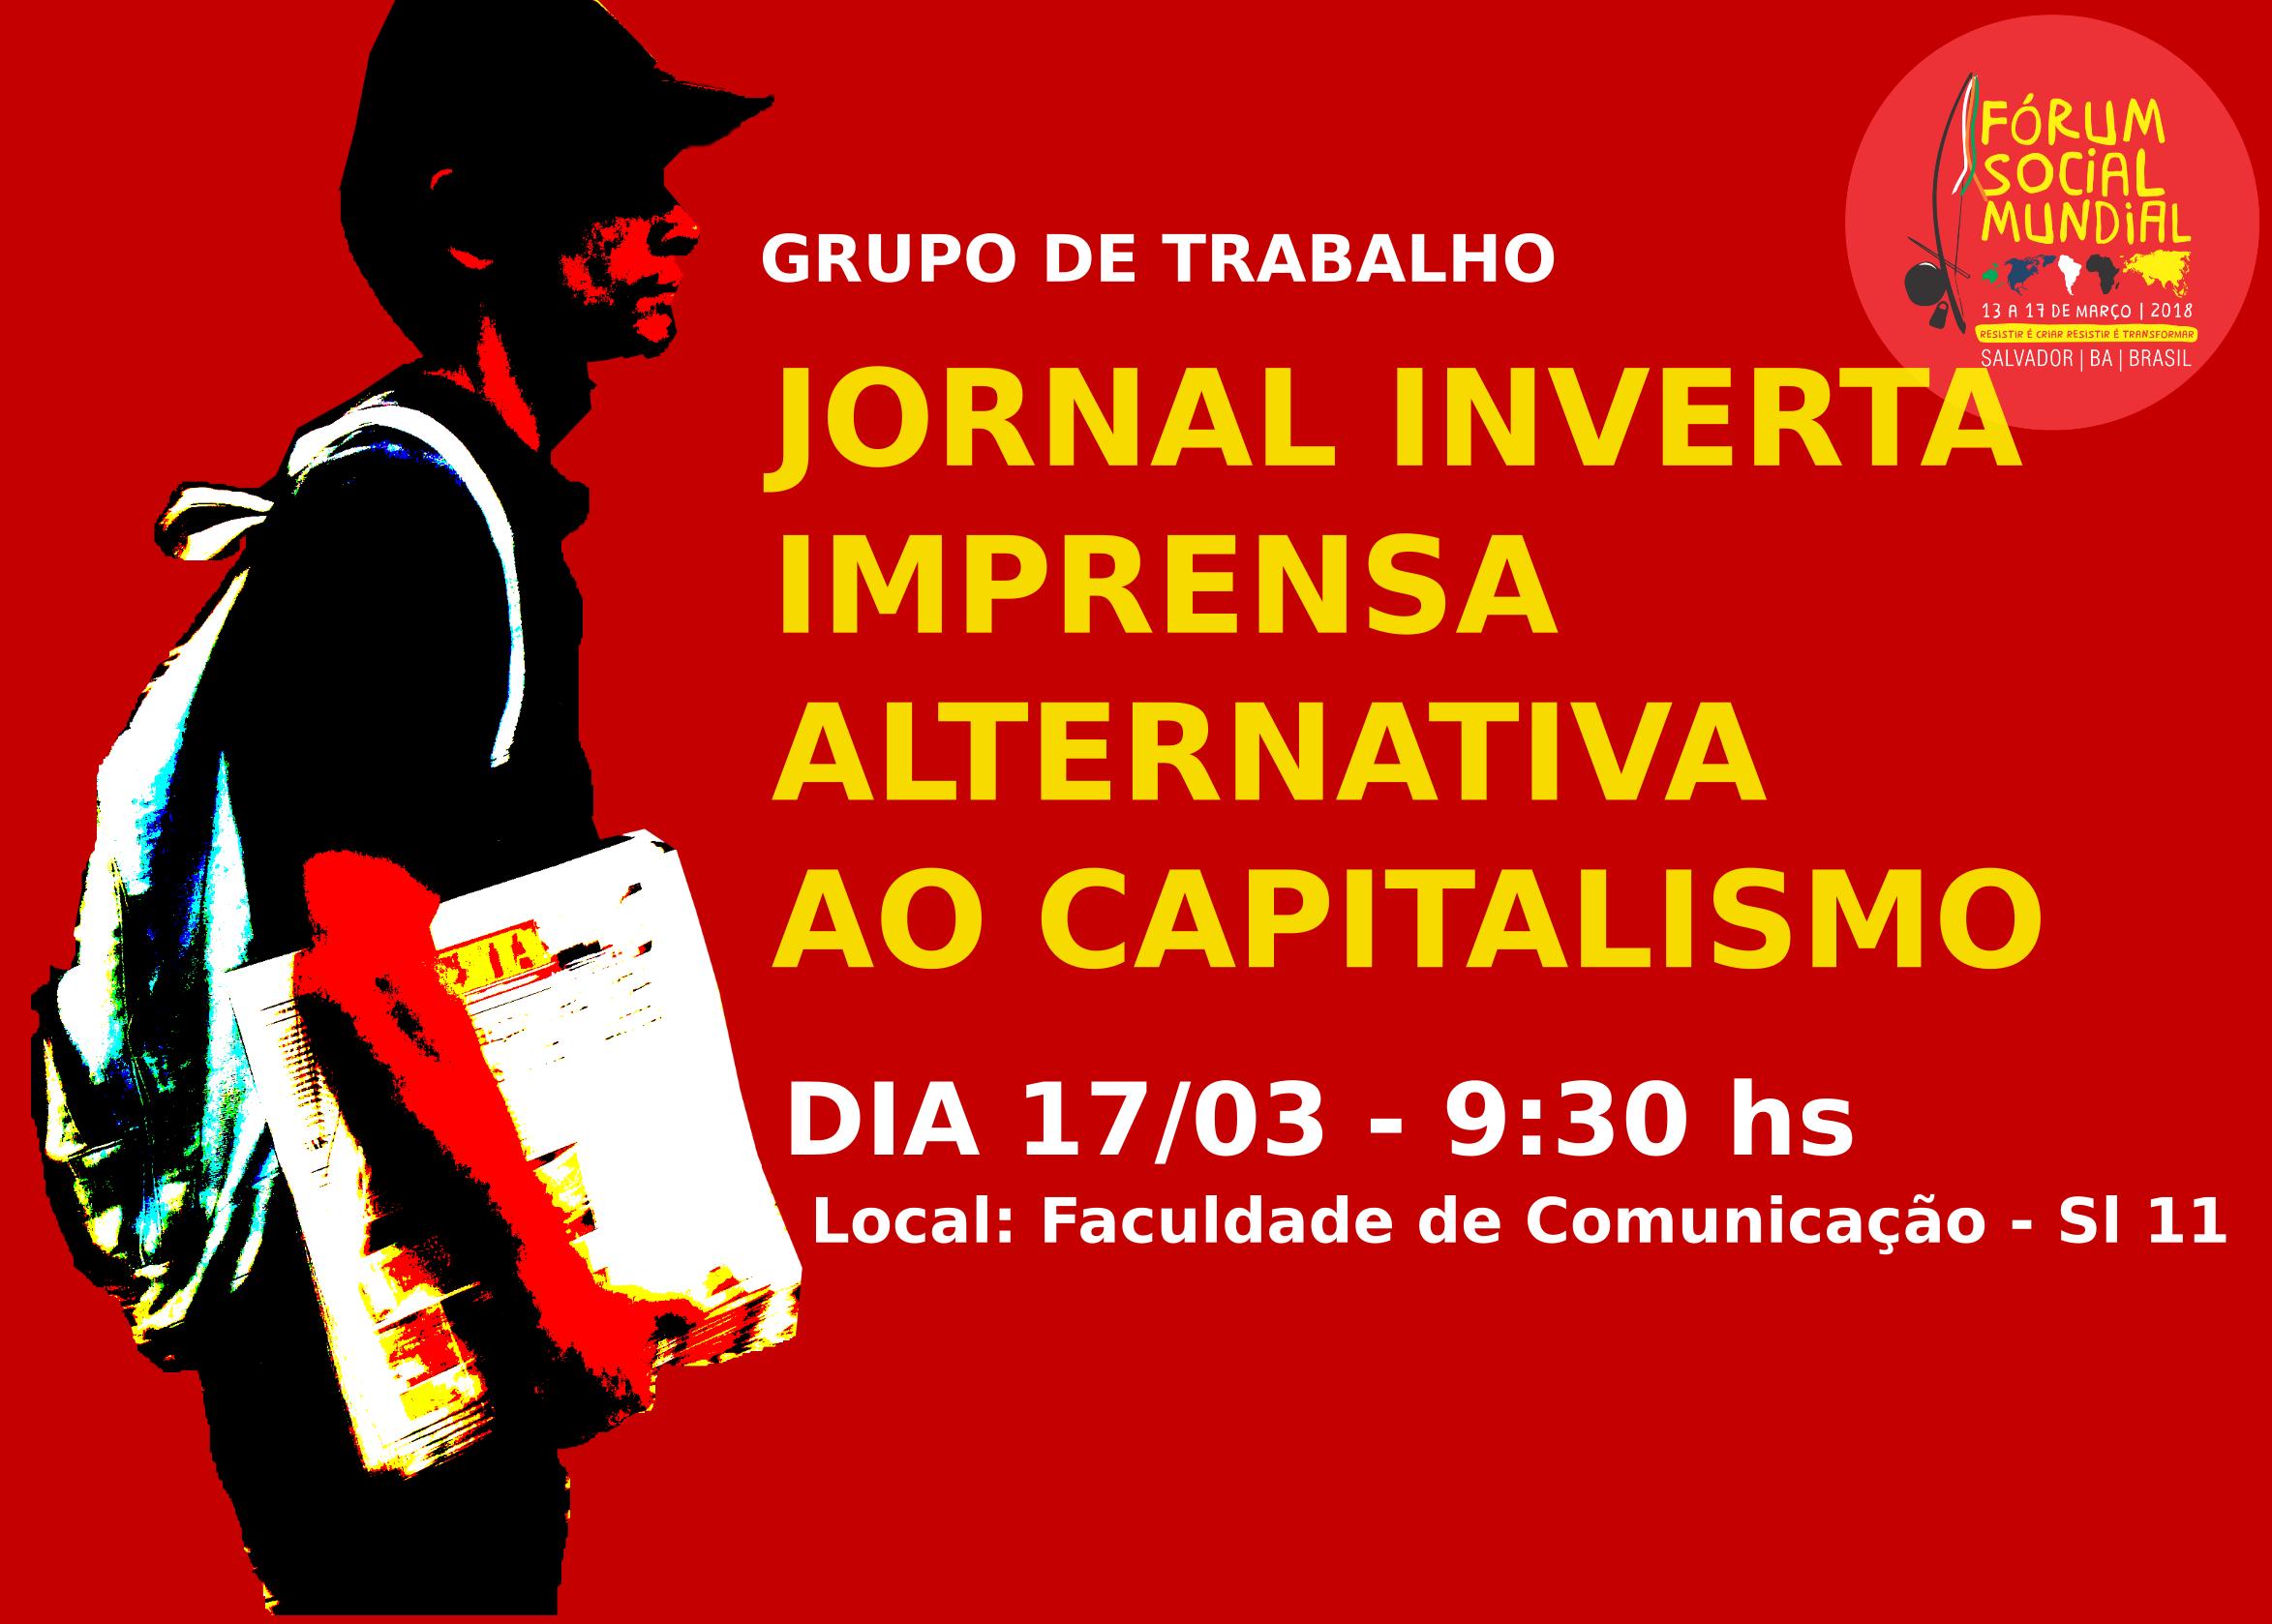 Grupo de Trabalho - JORNAL INVERTA IMPRENSA ALTERNATIVA AO CAPITALISMO